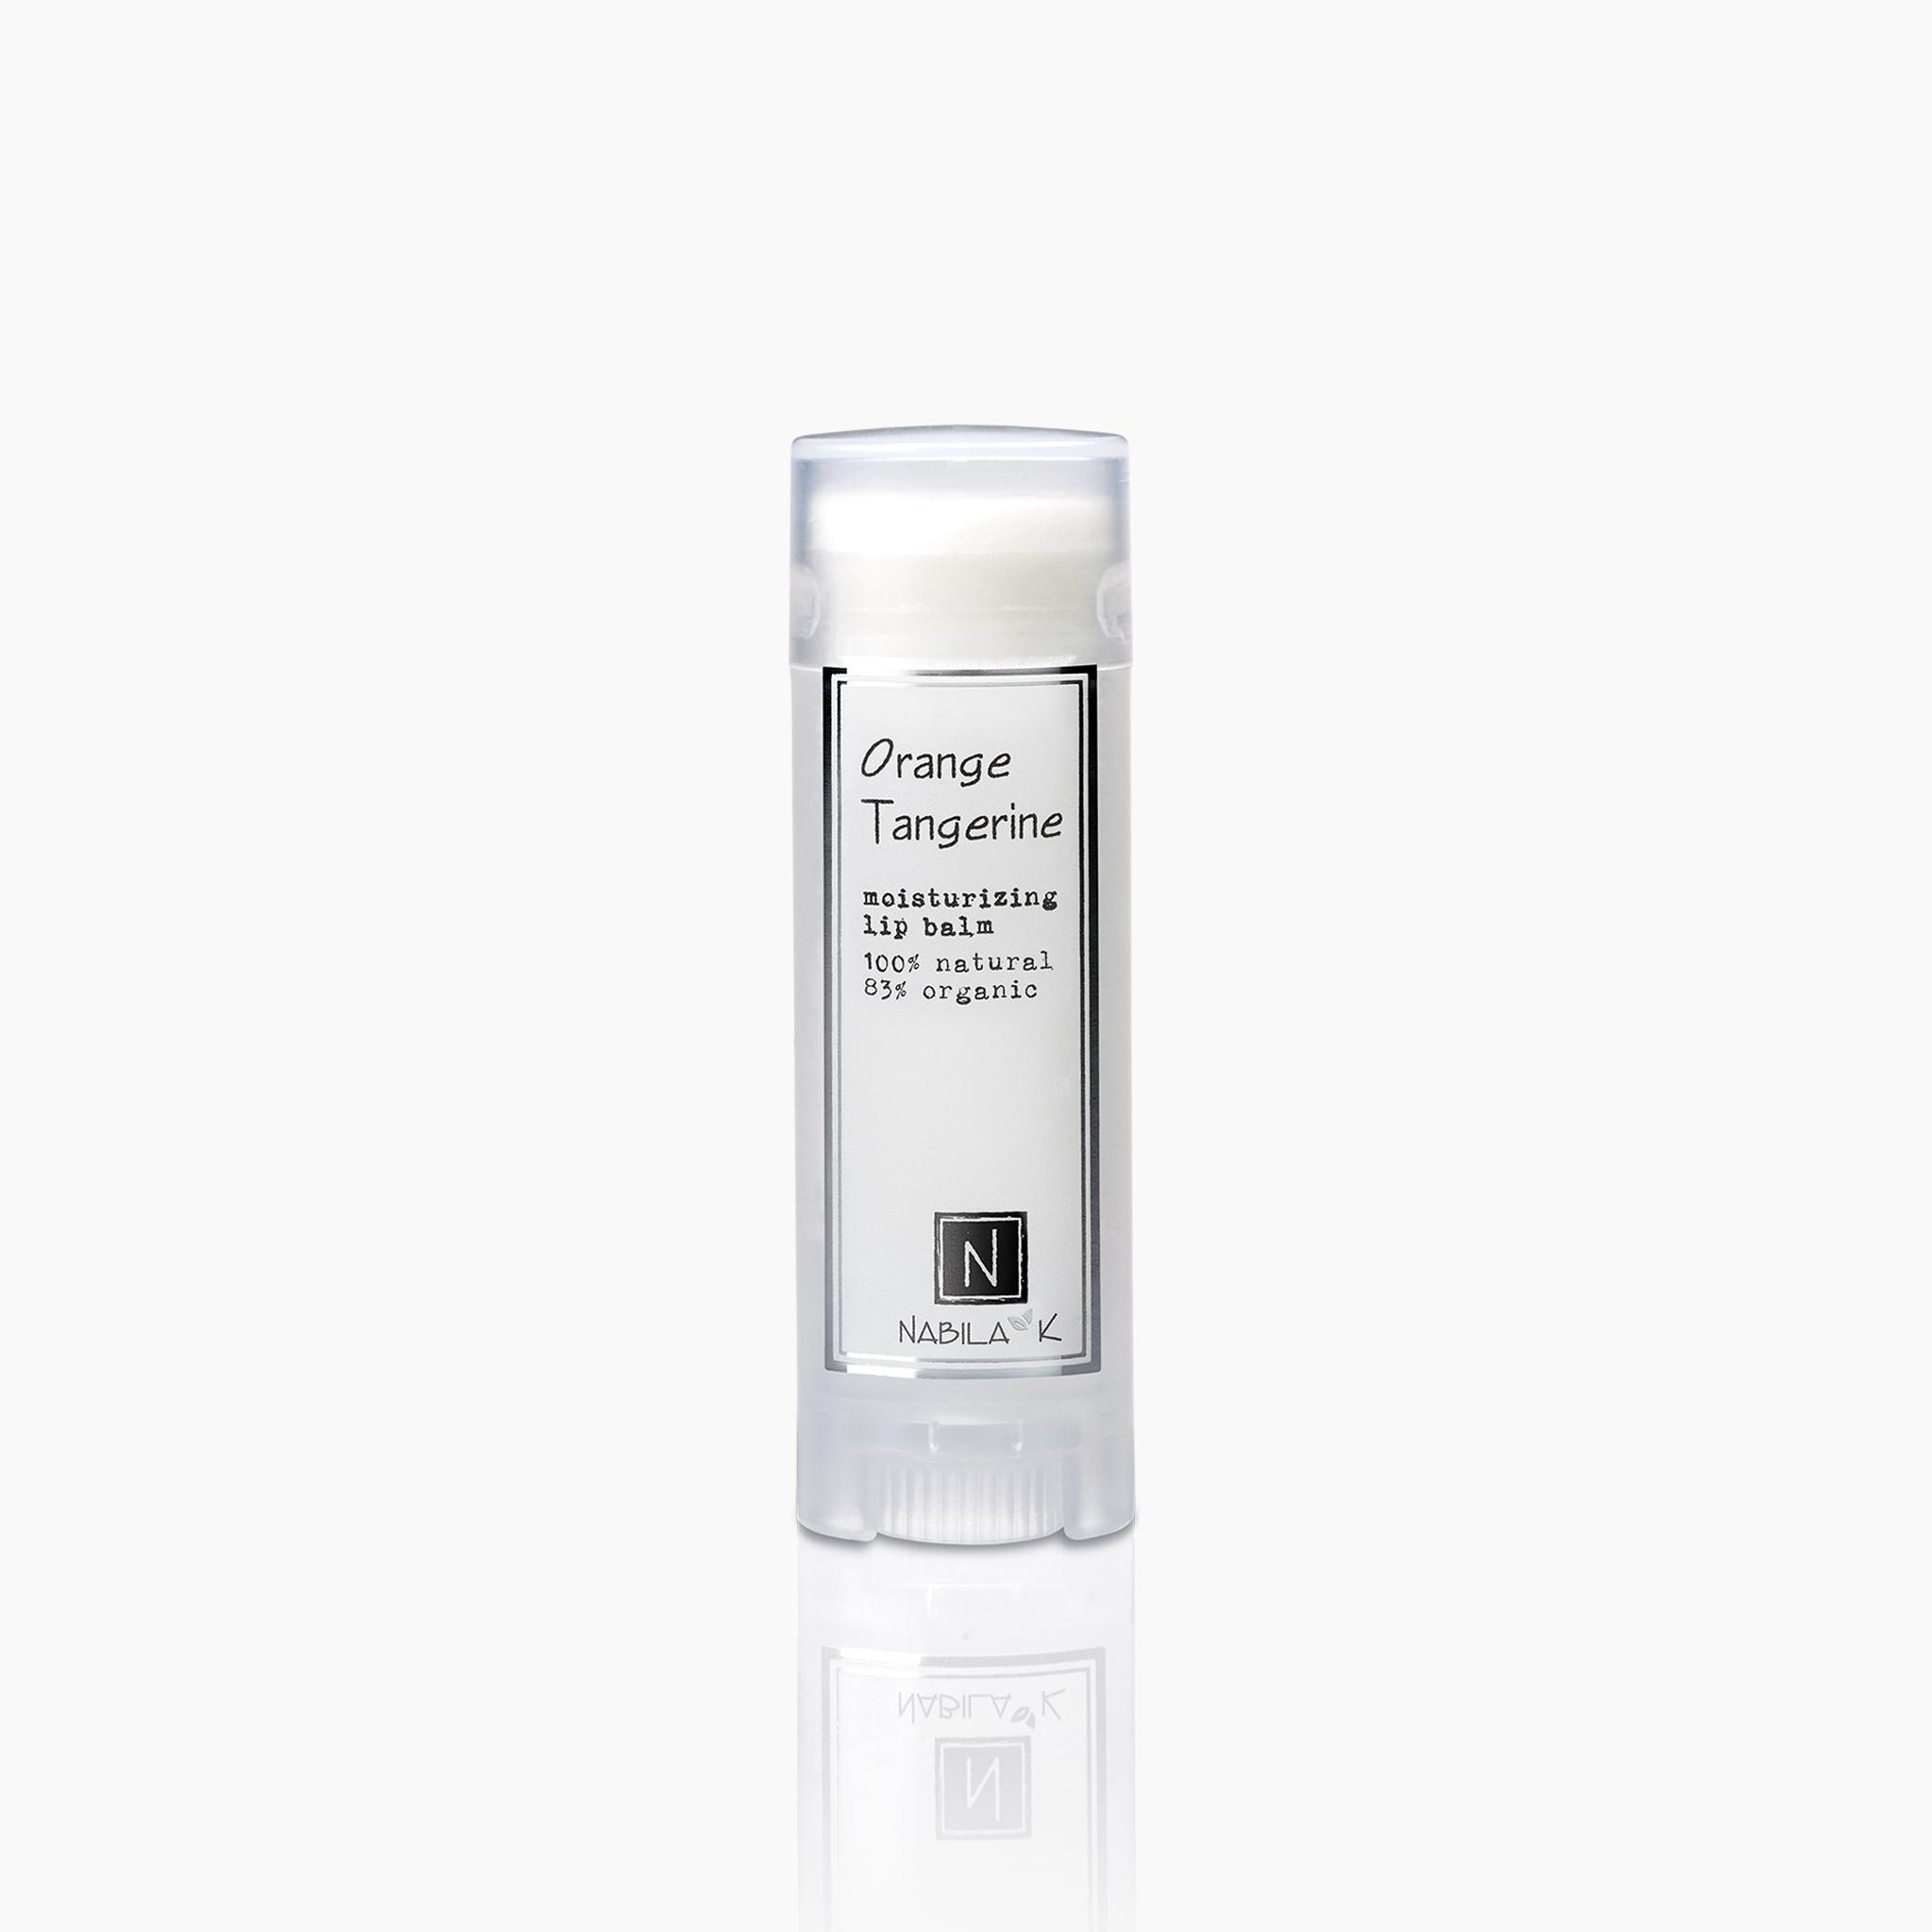 orange tangerine moisturizing lip balm 100% natural 85% organic